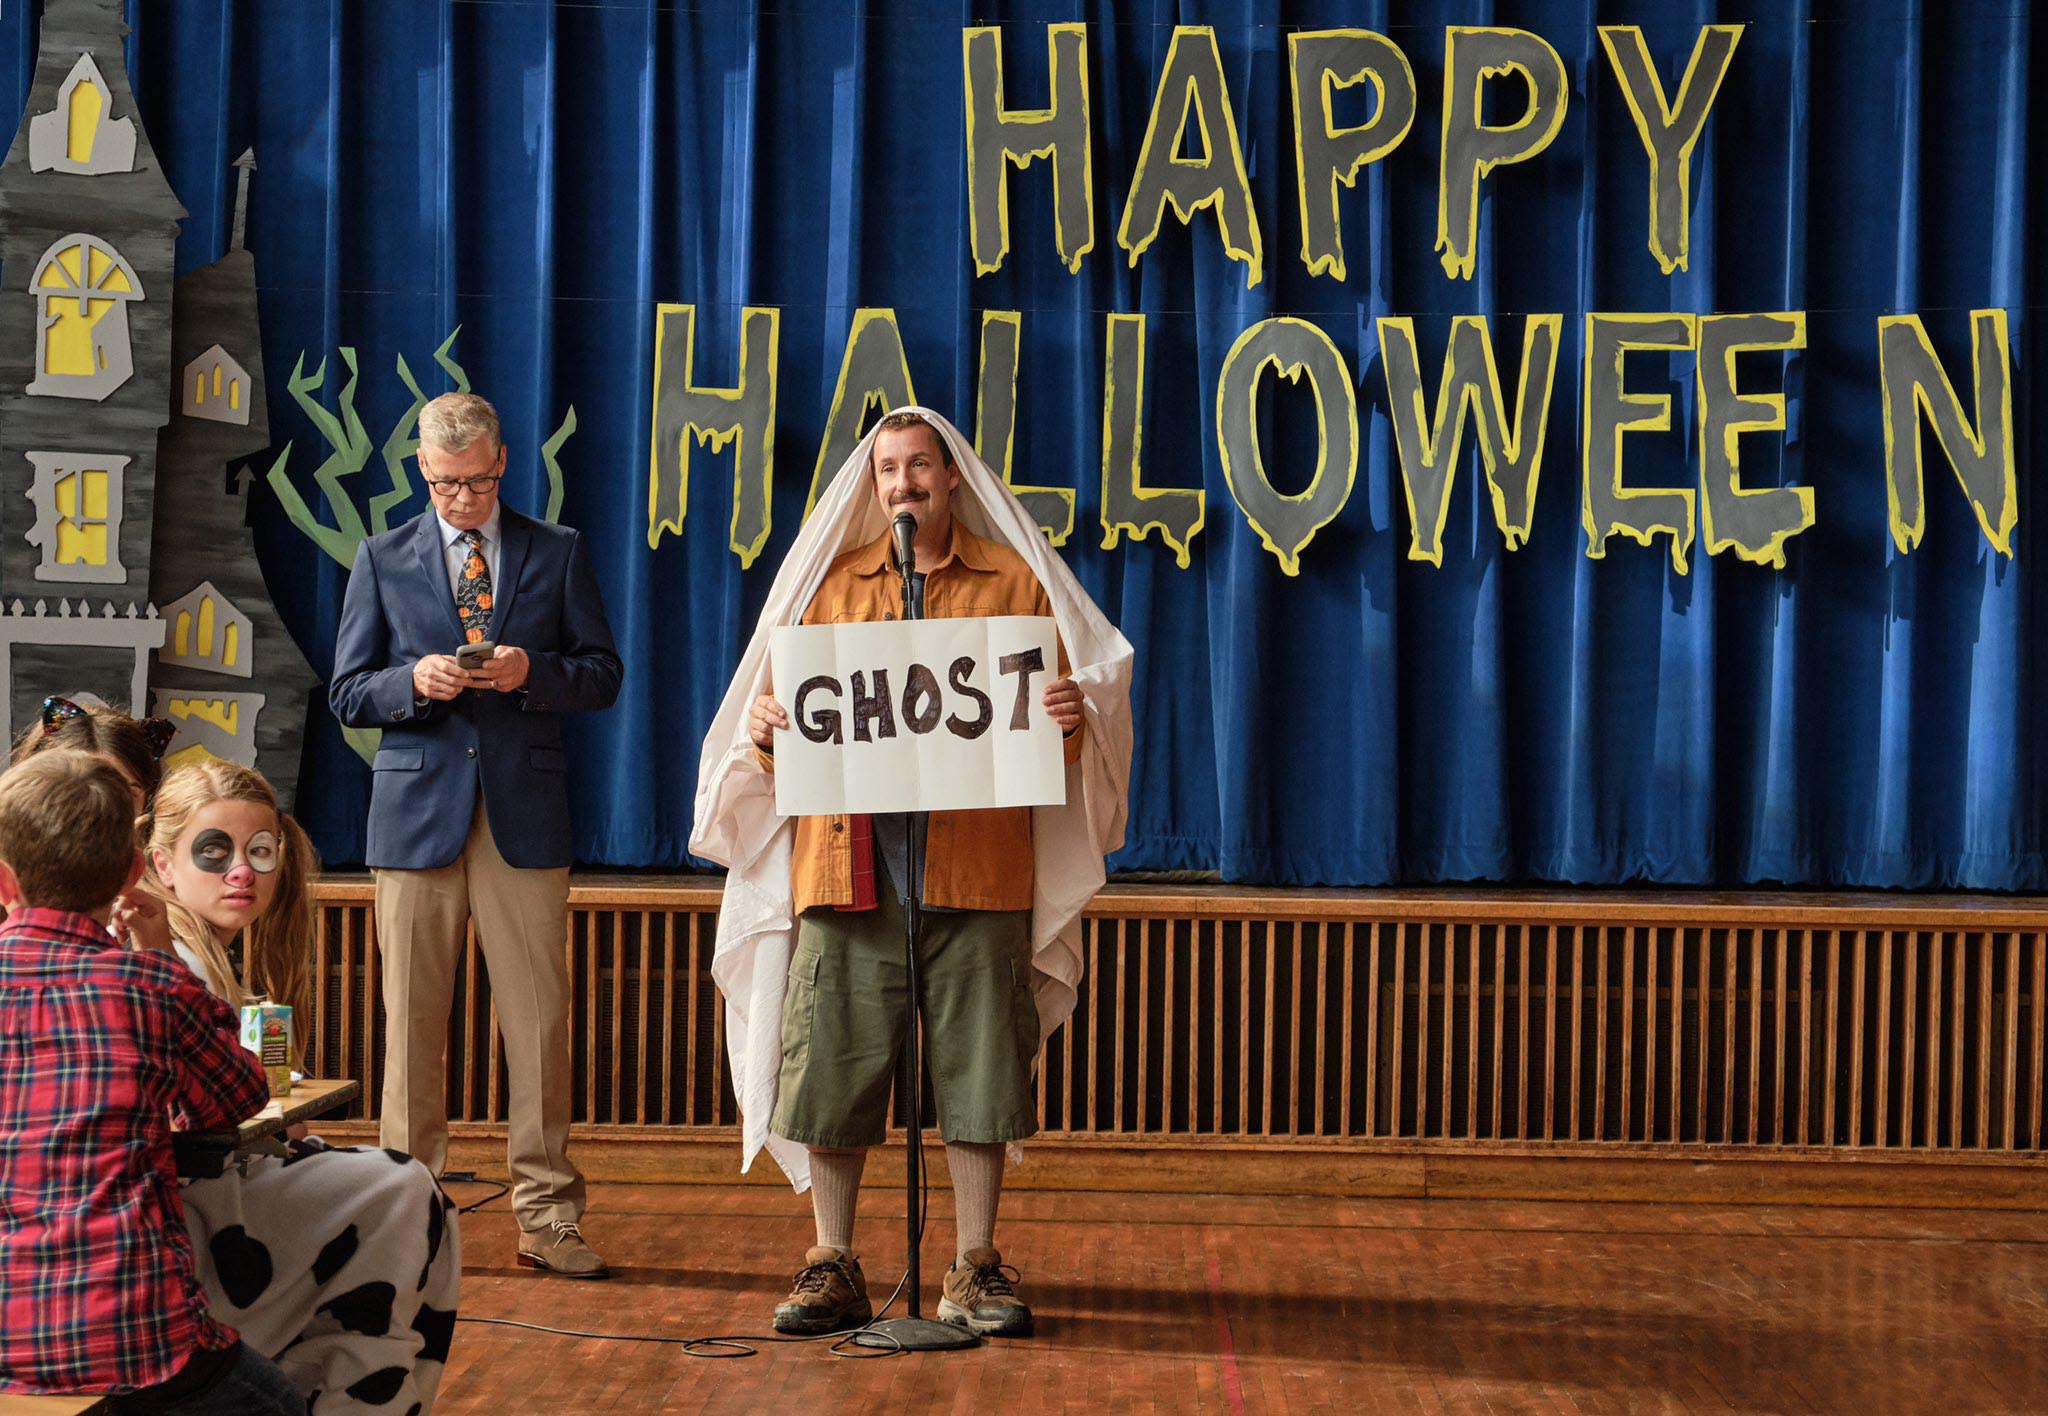 Adam Sandler, le fantôme de Hubie Halloween